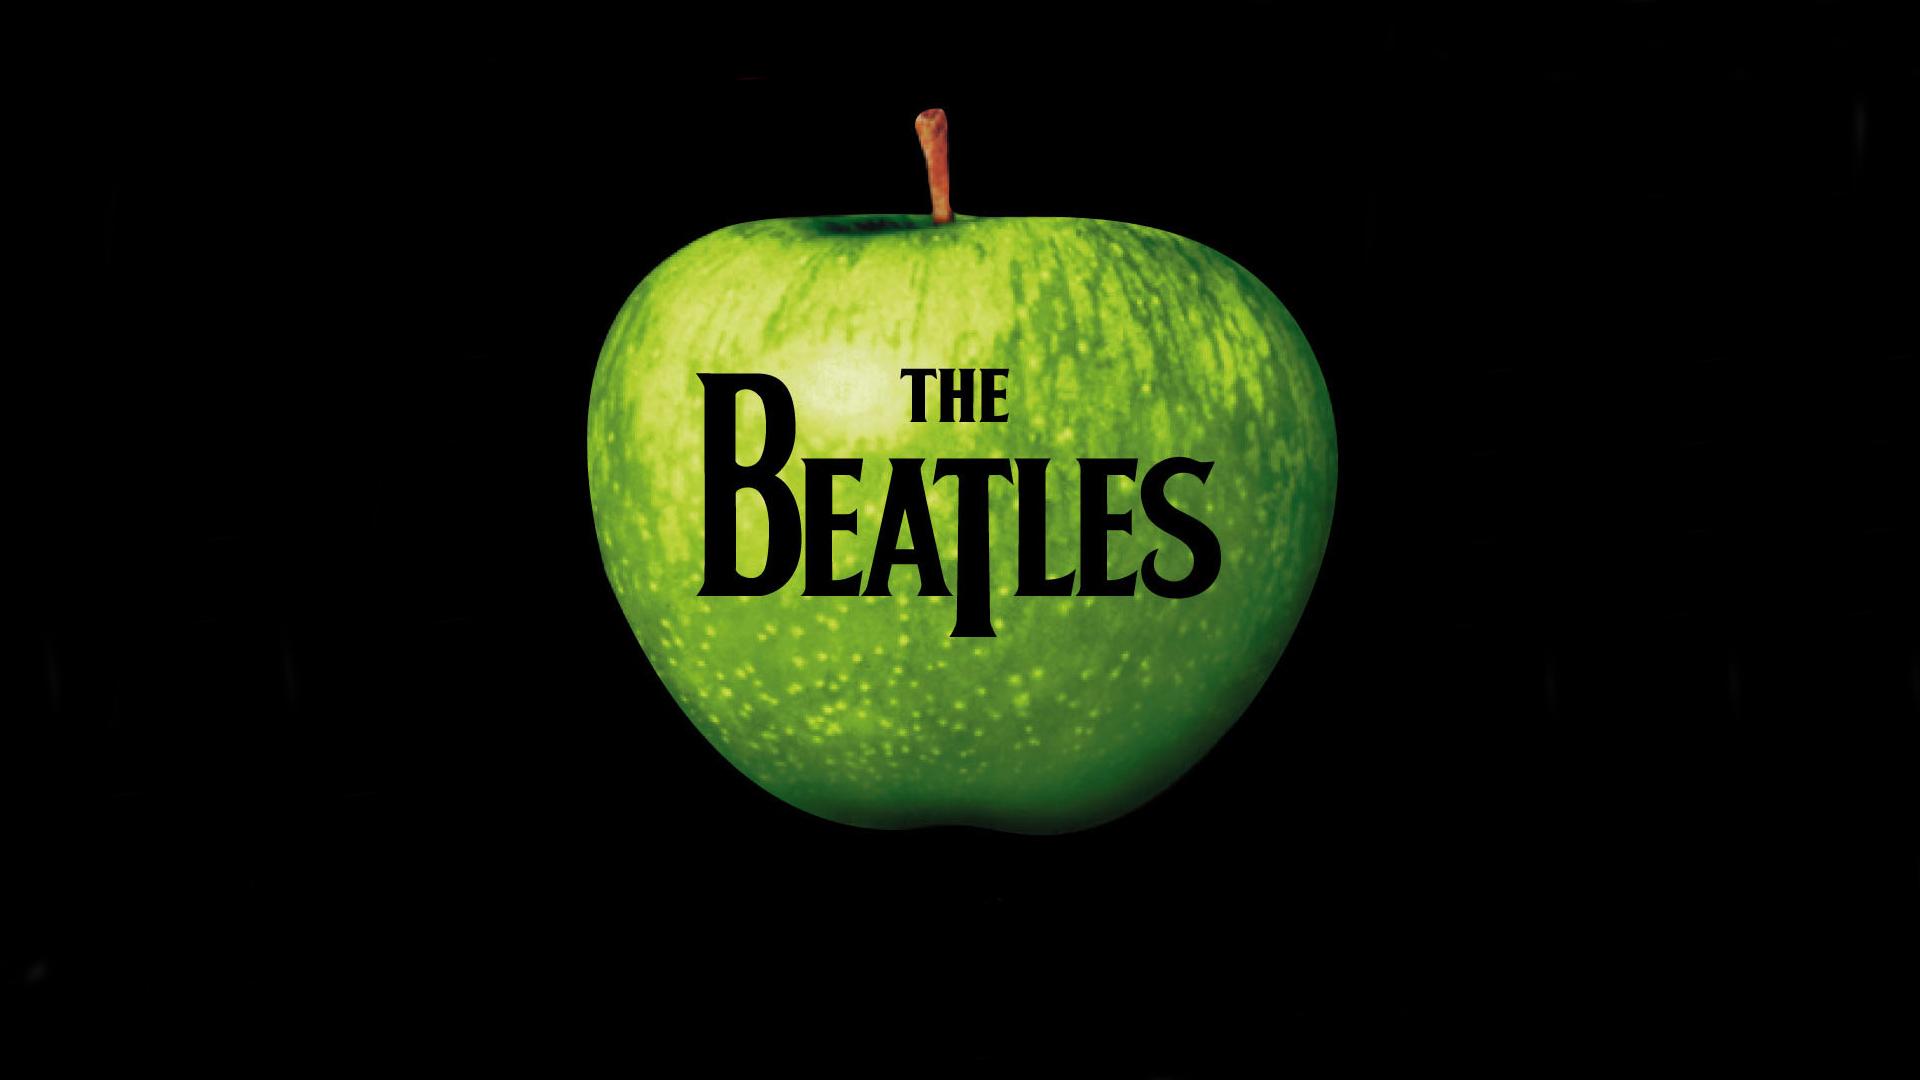 Beatles apple Logos